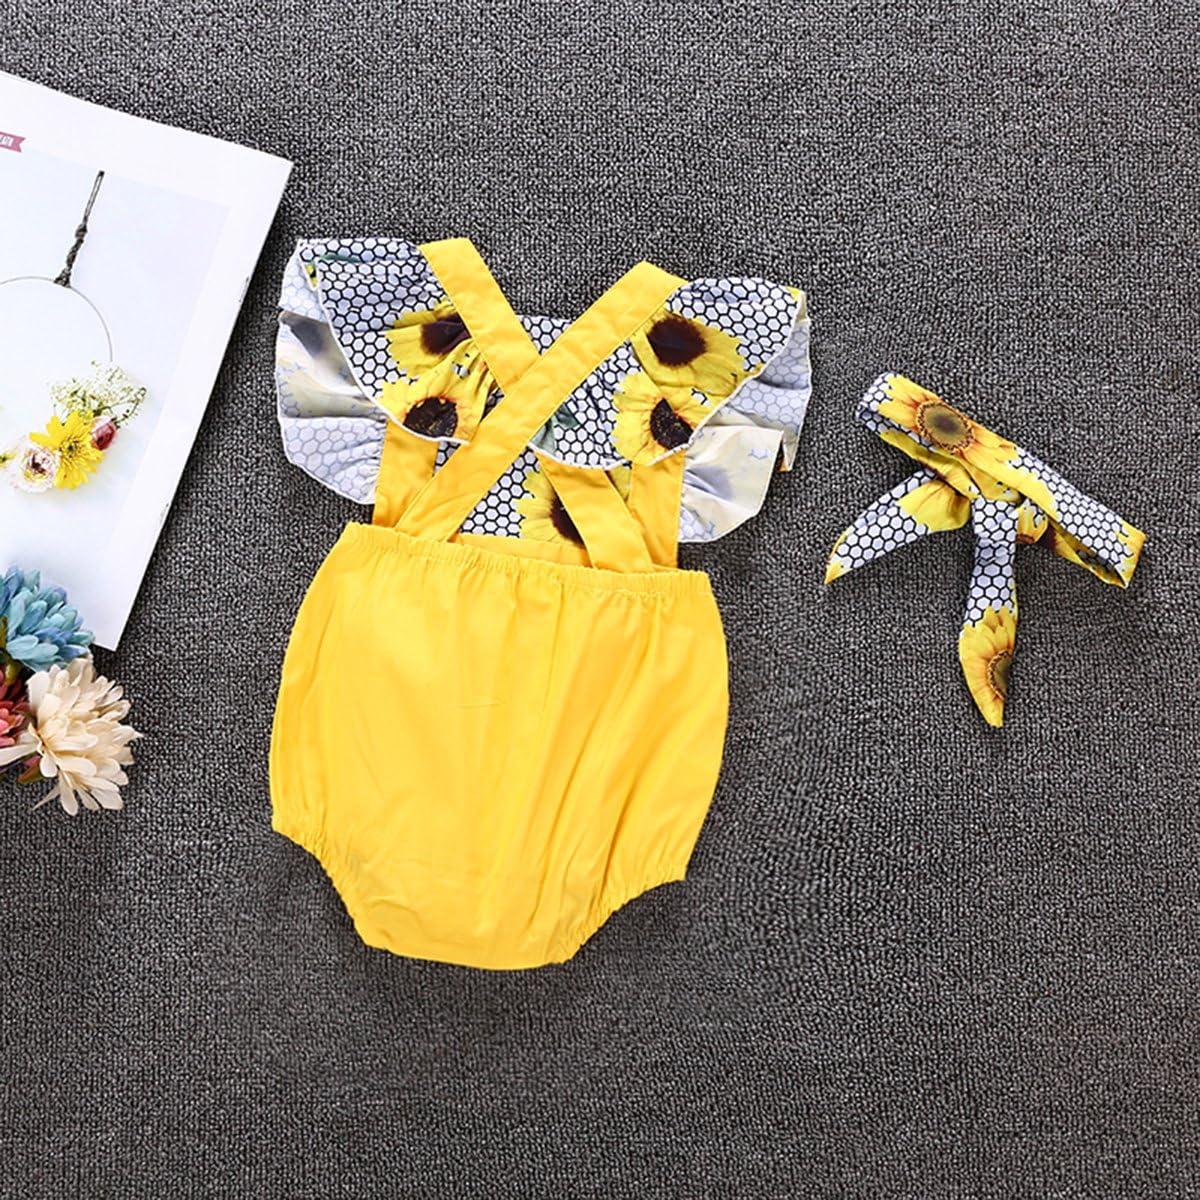 Tianhaik Beb/é Ni/ña Mameluco de Flores de Verano con Volantes de Manga Impresa Mono Mono Trajes de 0-18 Meses